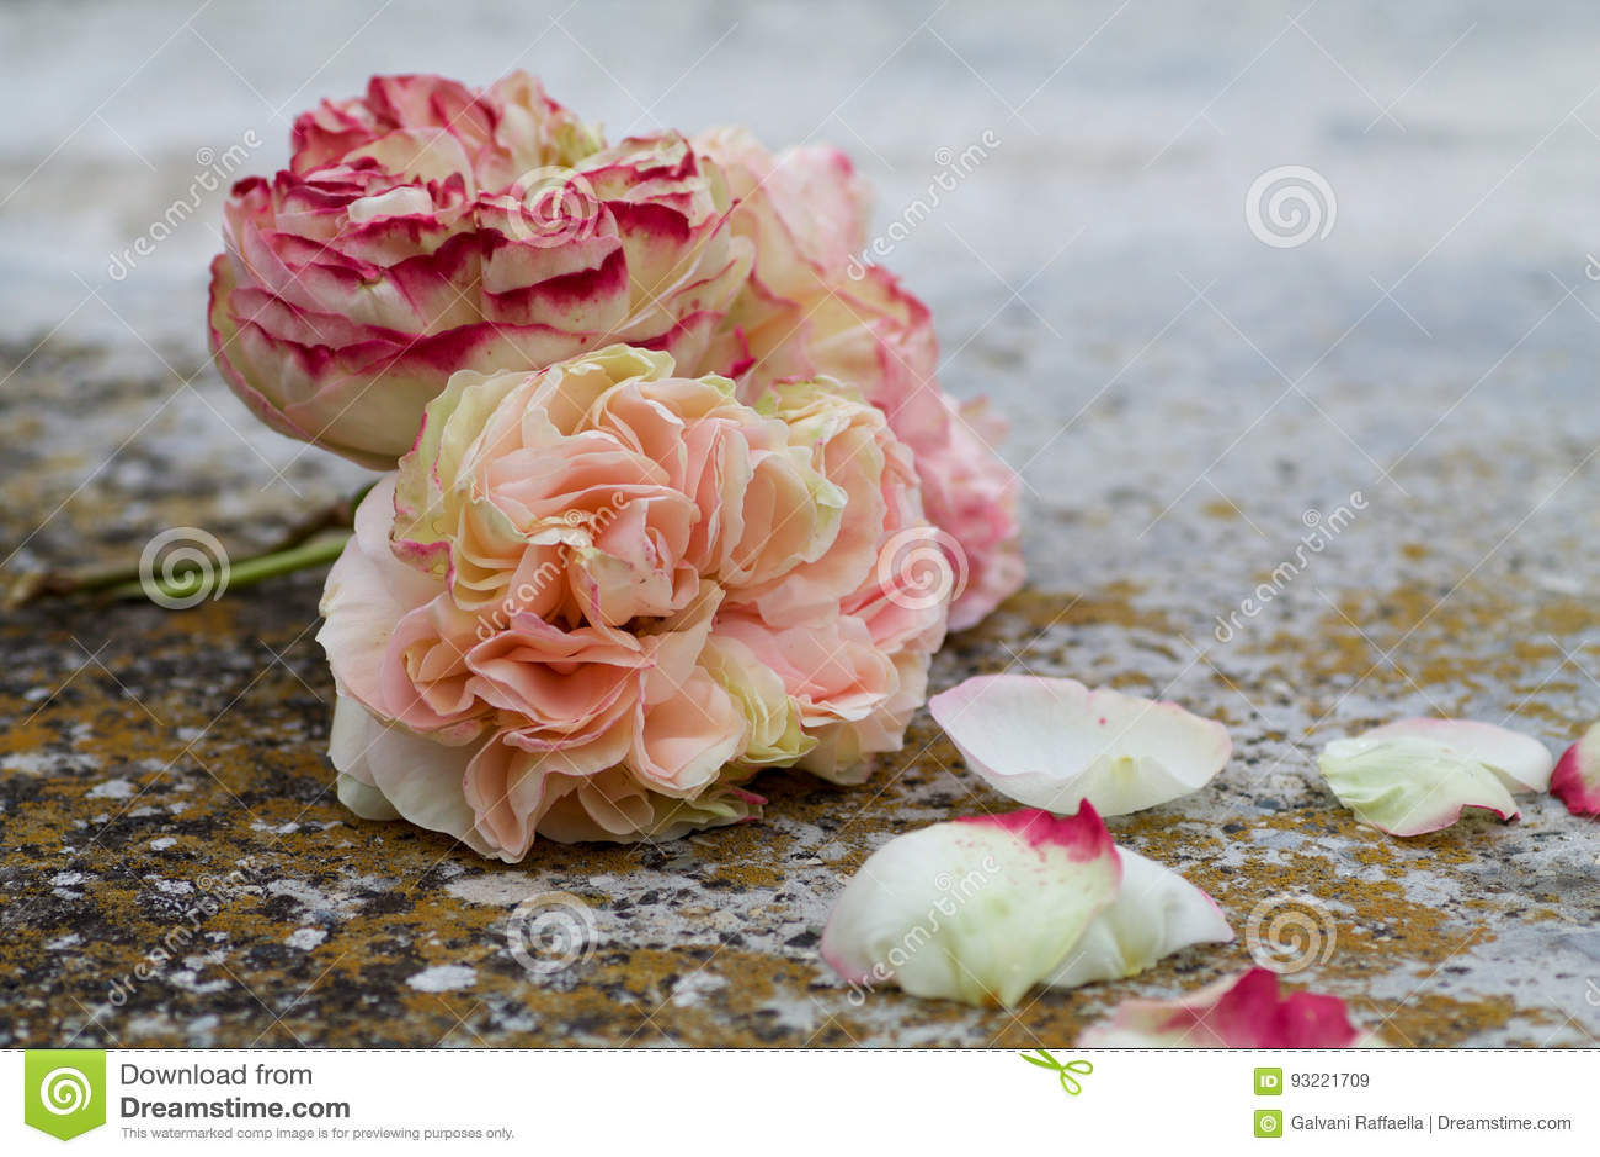 Beautiful Pierre De Ronsard Rose Lean On The Ground Stock